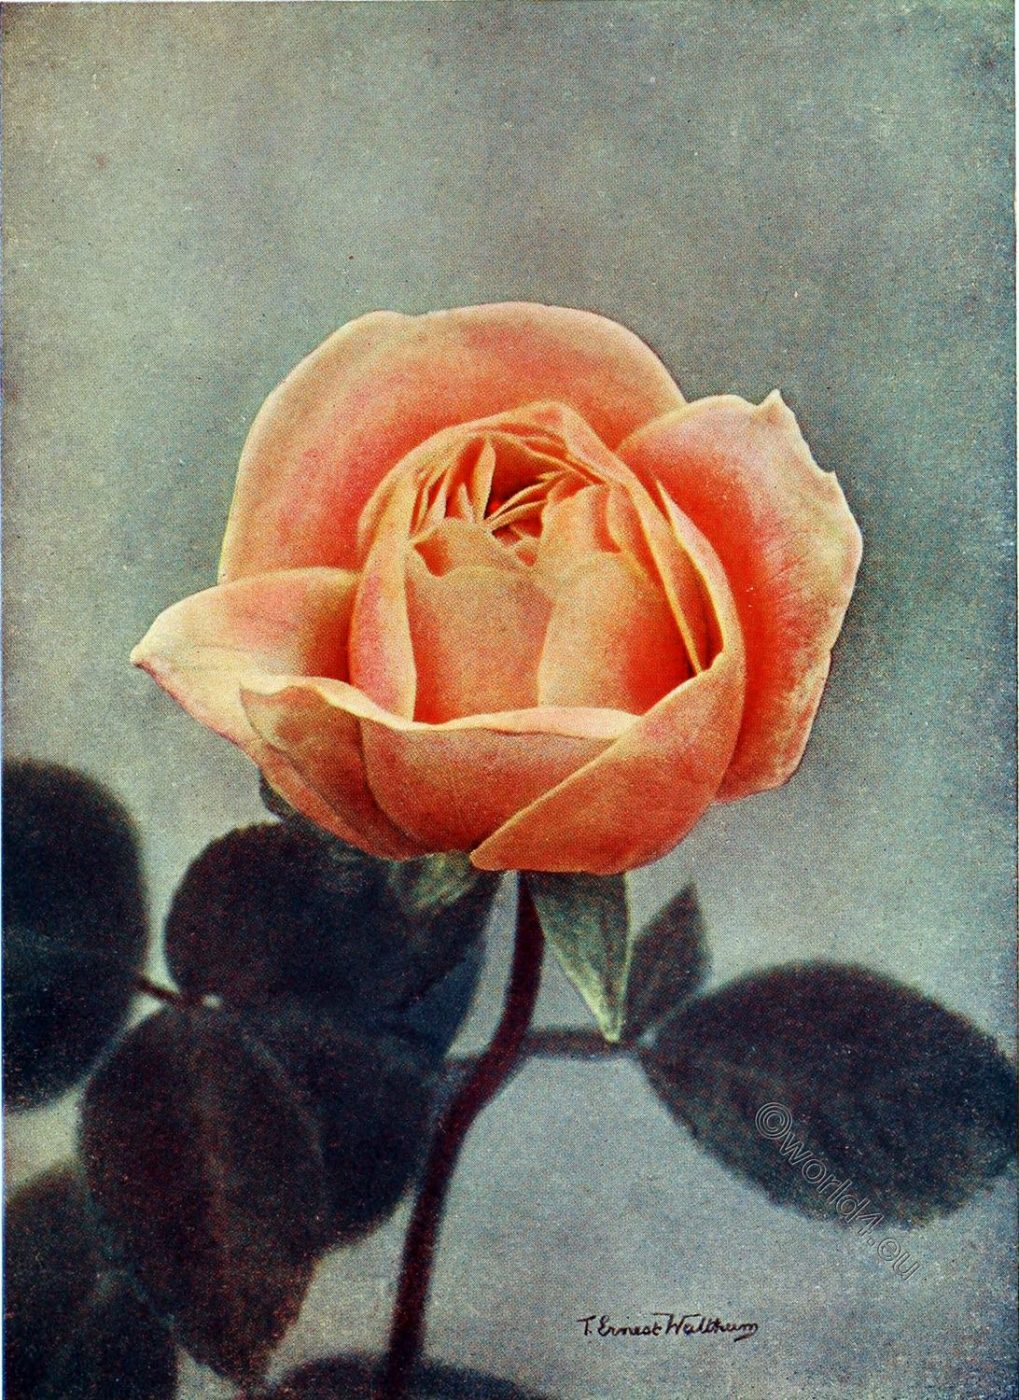 Madame Ravary, Old Roses, Joseph Pernet-Ducher, rosarian